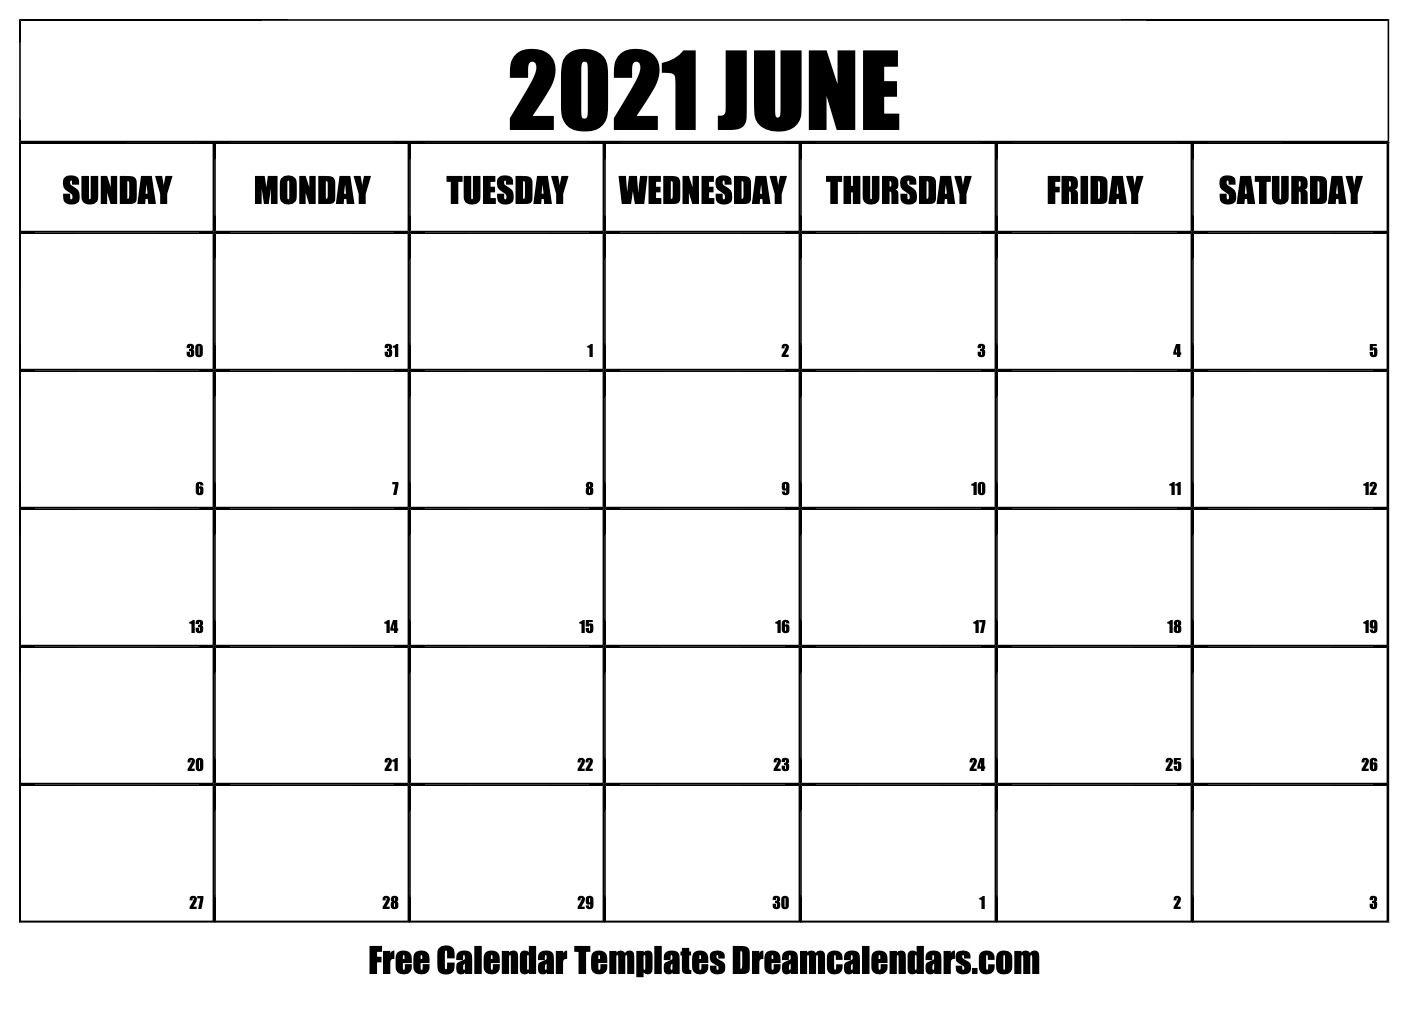 June 2021 Calendar | Free Blank Printable Templates